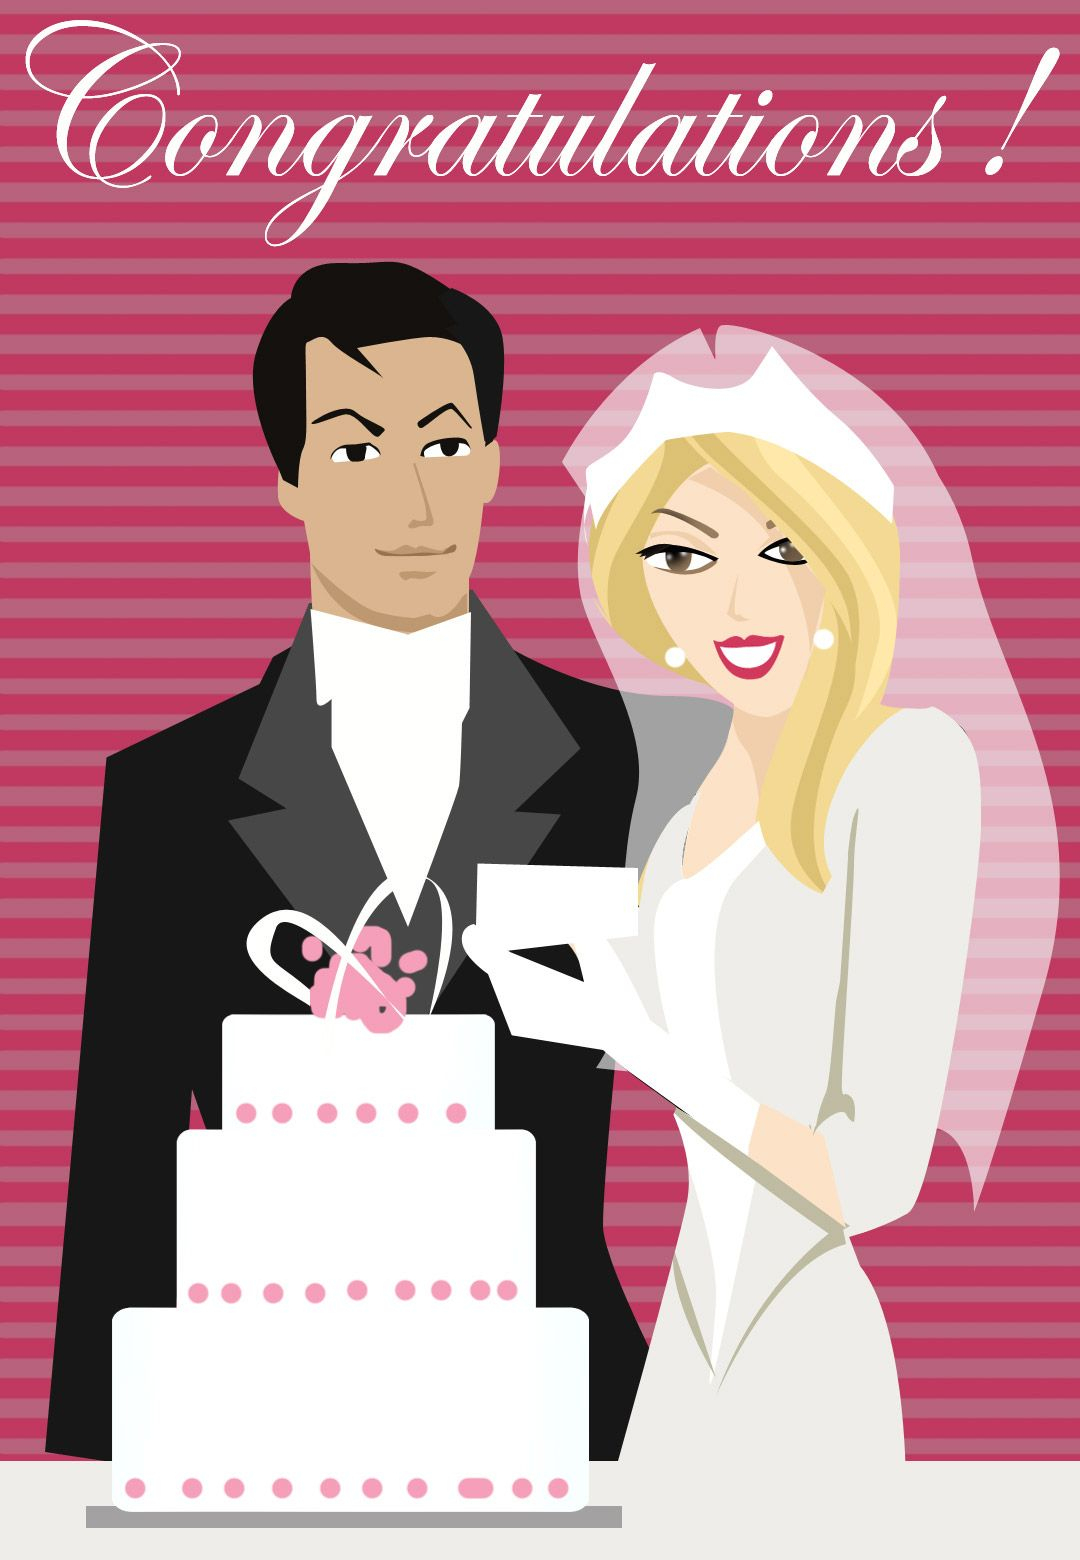 Free Printable Congratulations Greeting Card   Wedding Cards To - Free Printable Wedding Congratulations Greeting Cards